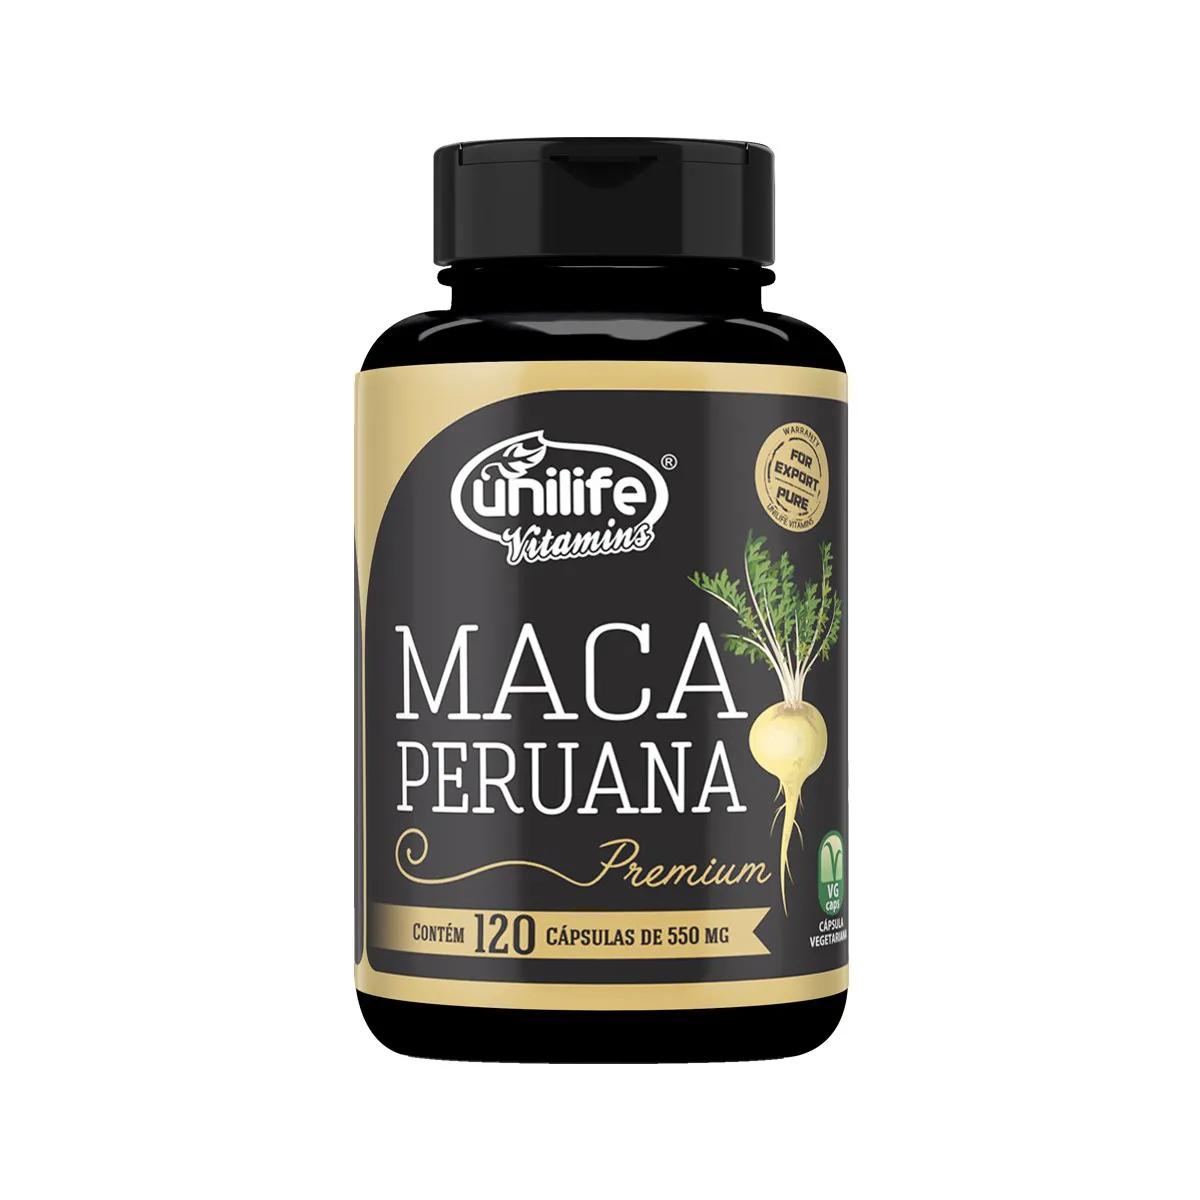 Maca Peruana Premium 550mg 120 Cápsulas - Unilife